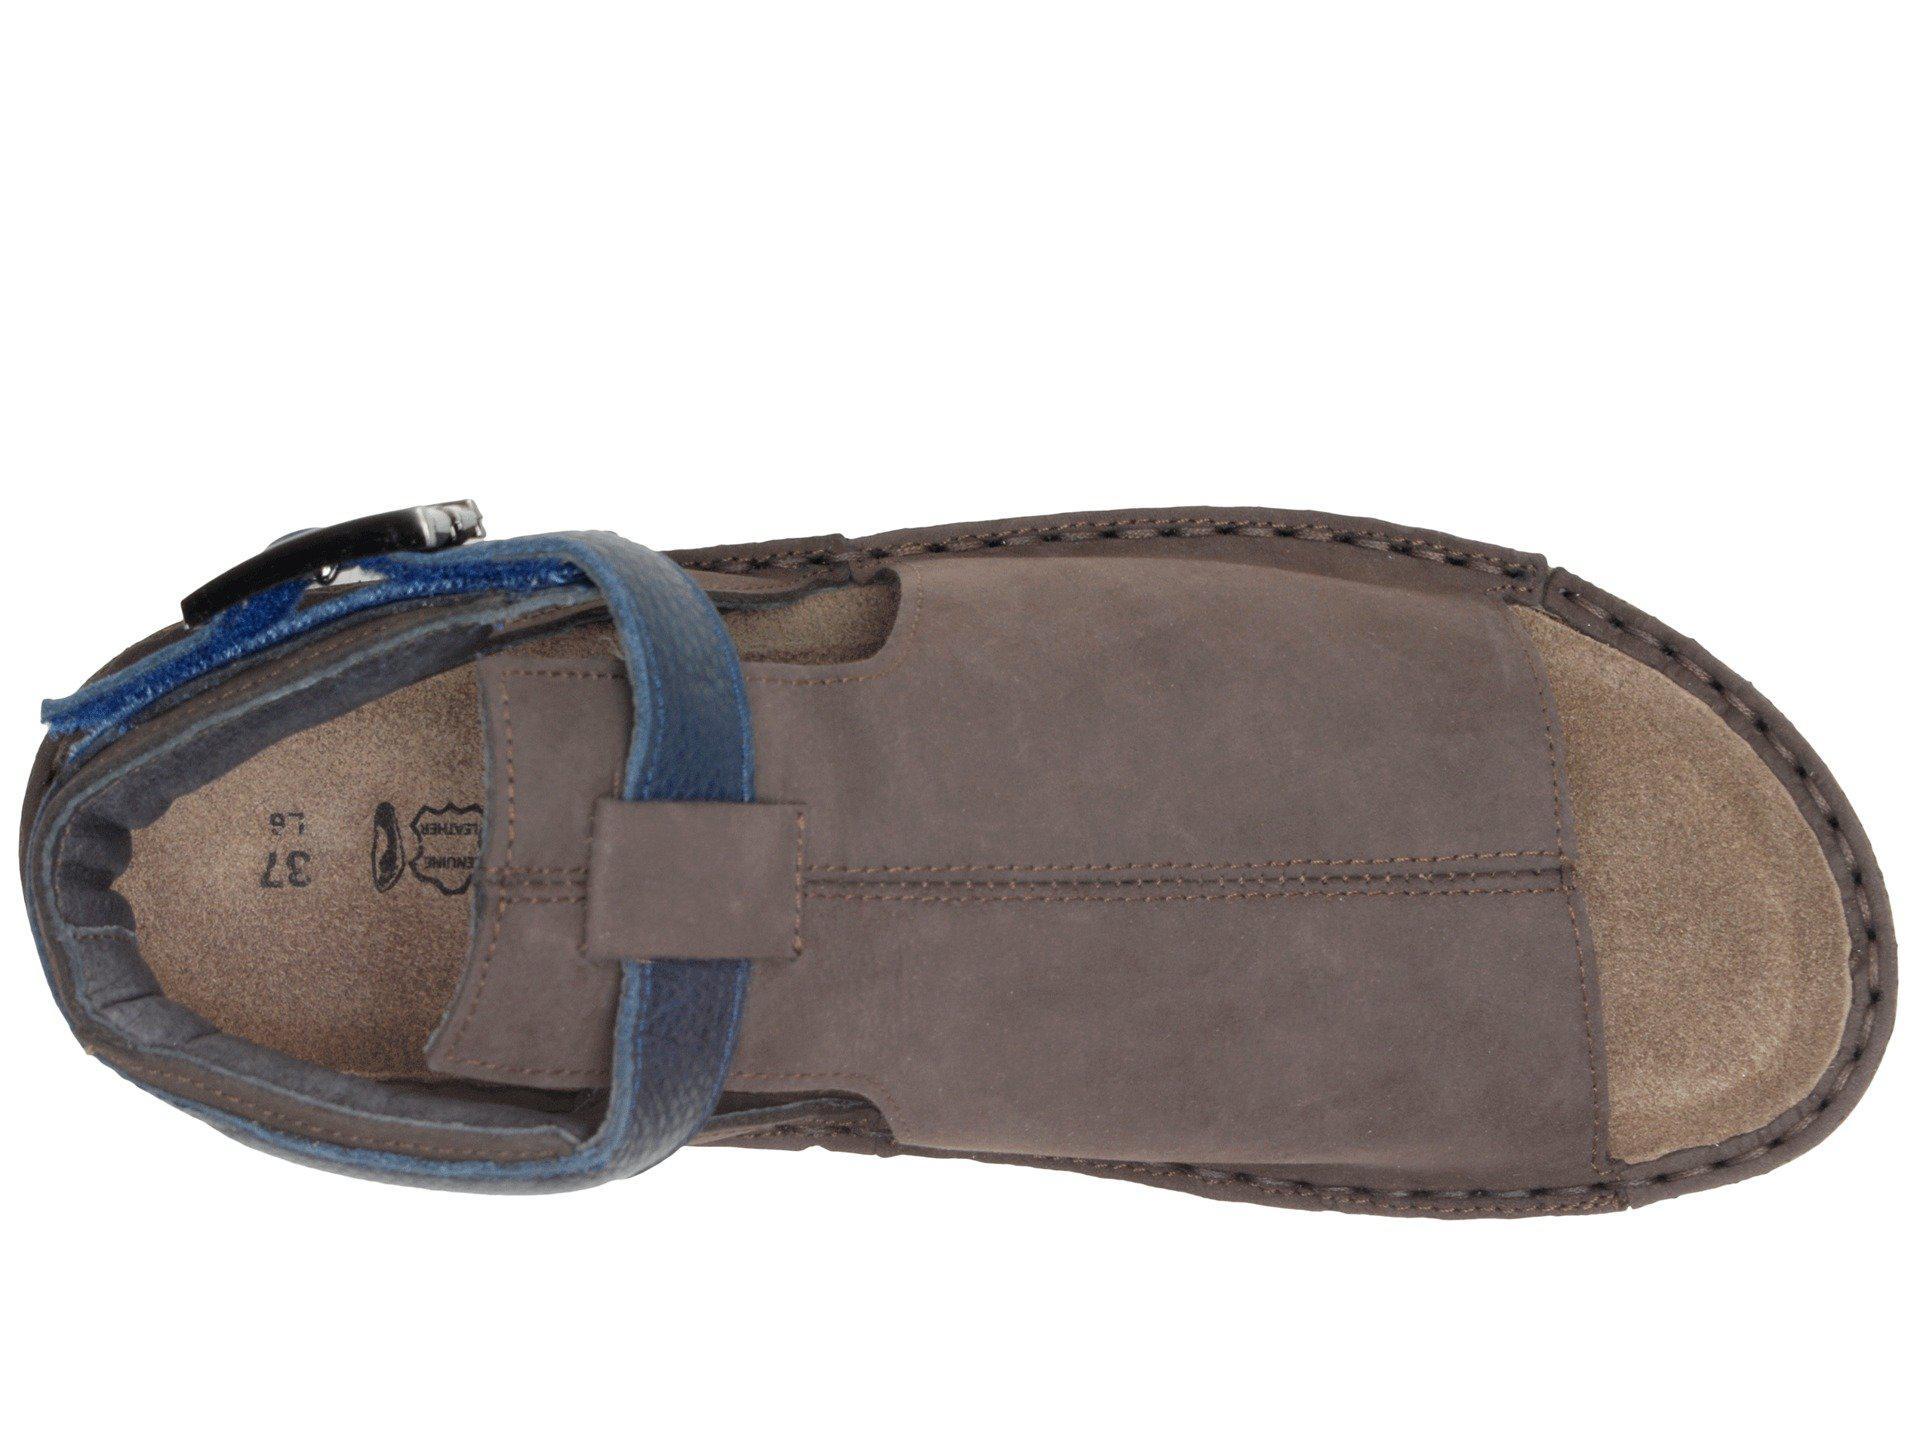 f28332f5b66c Naot - Verbena (stone Nubuck latte Brown Leather) Women s Shoes - Lyst.  View fullscreen